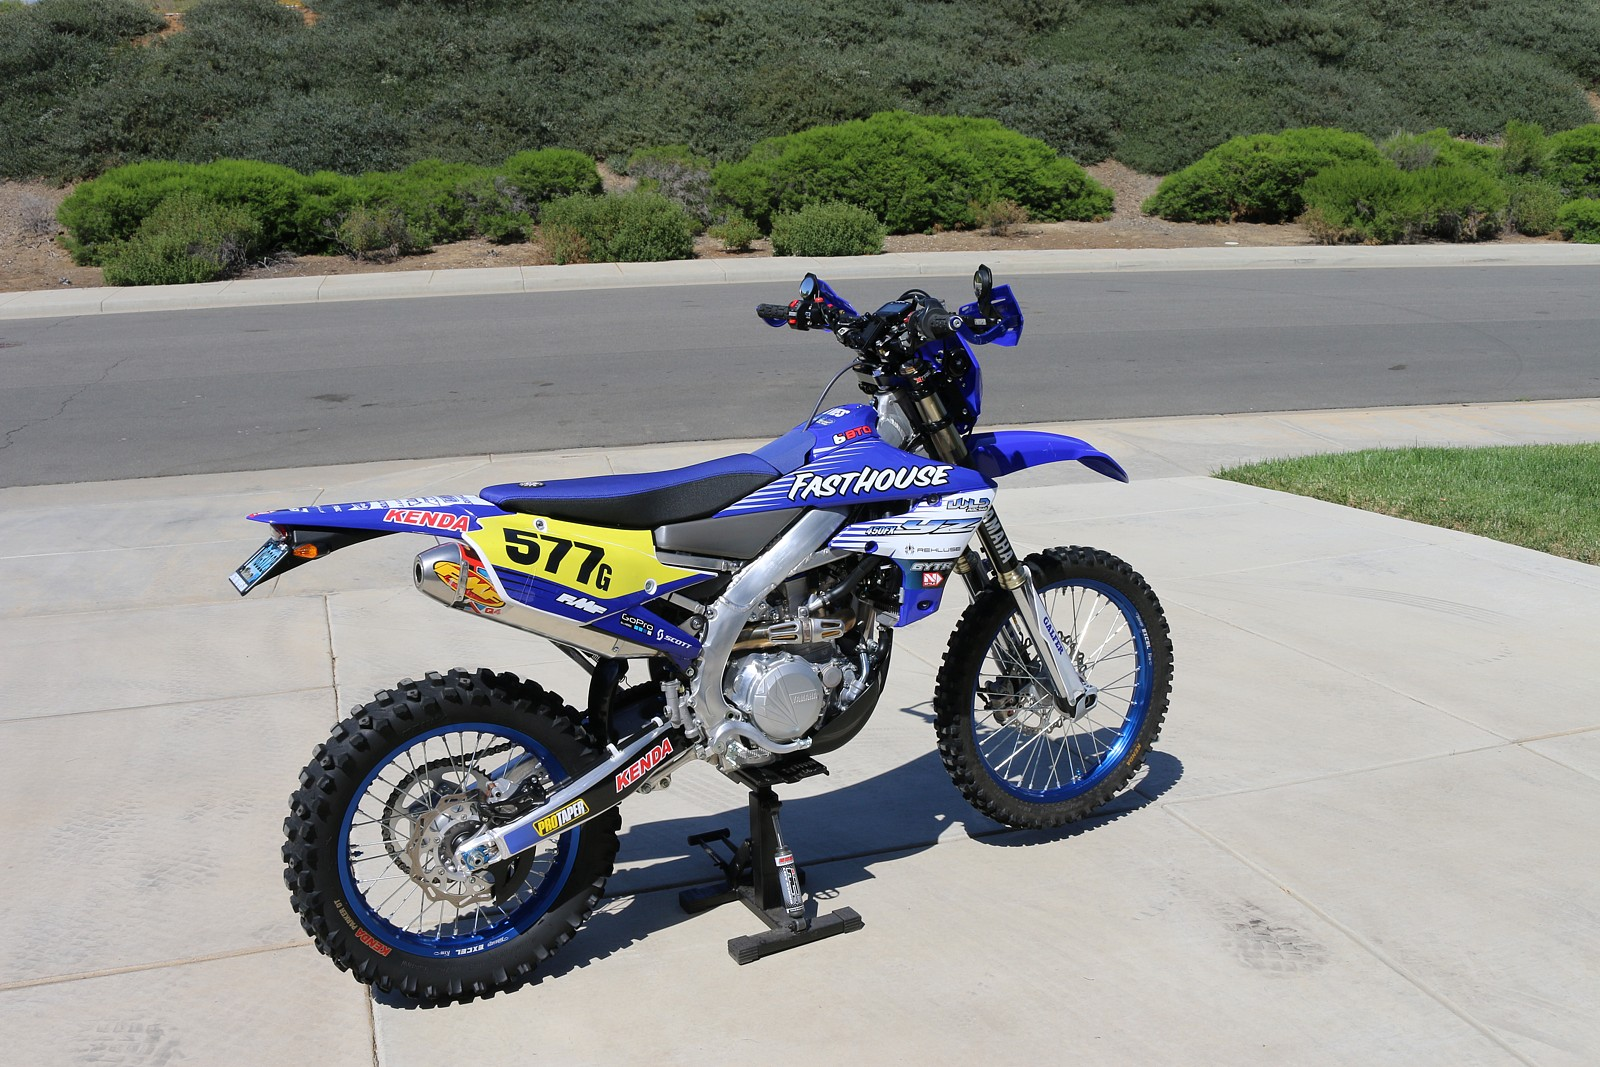 IMG 2861 - WLD - Motocross Pictures - Vital MX